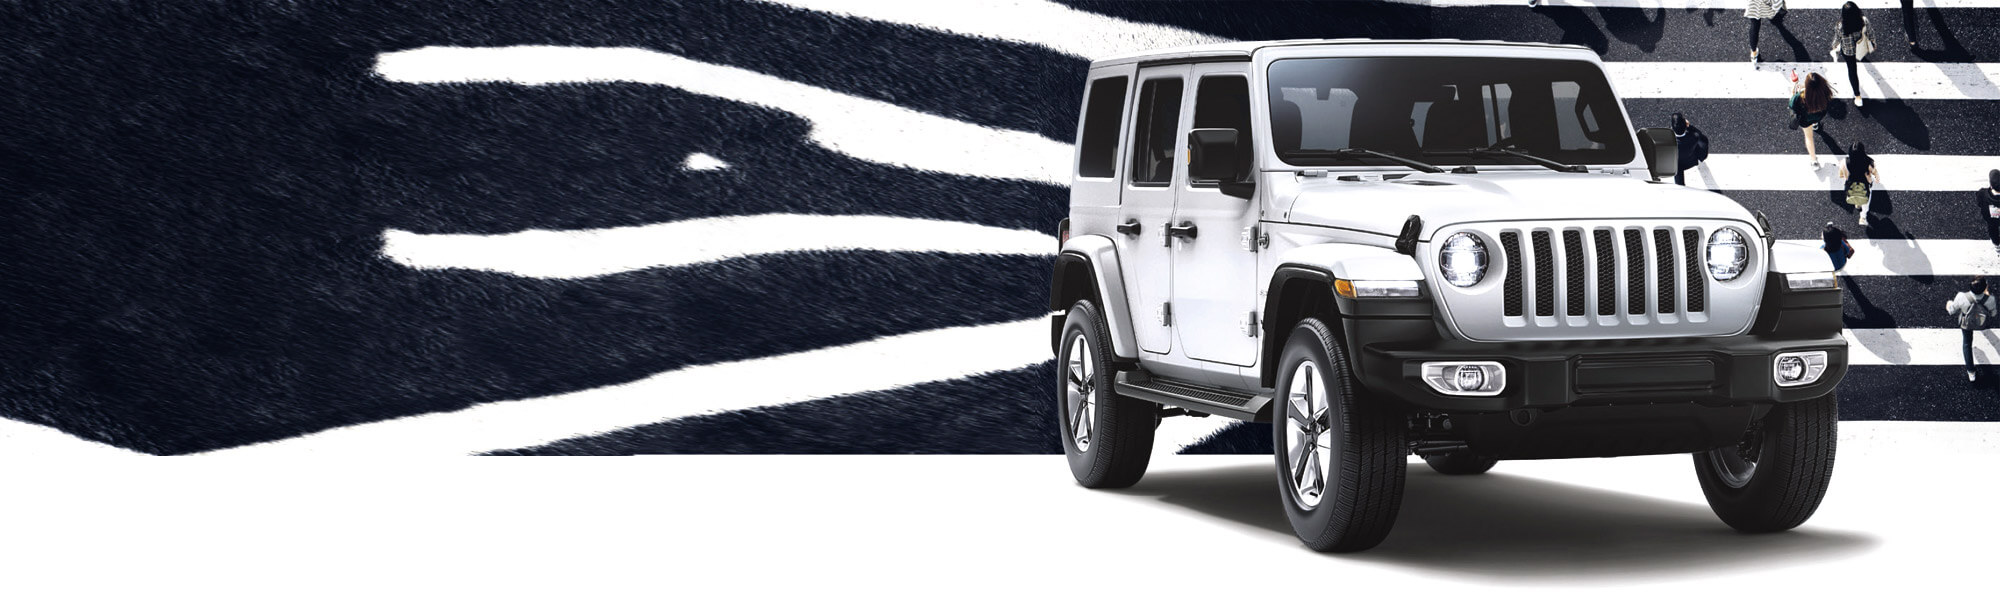 slider-jeep-wrangler